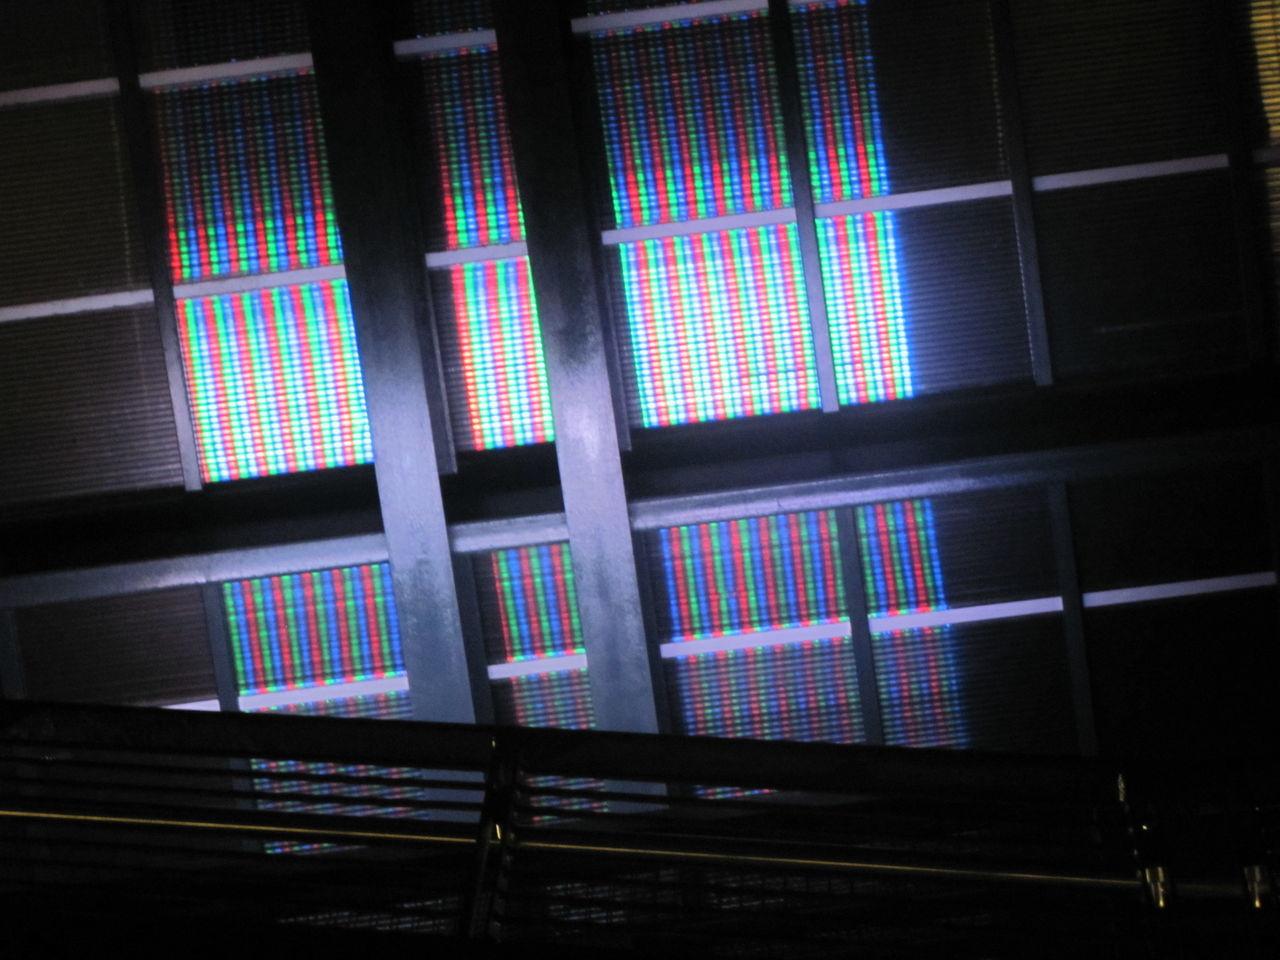 Built Structure Illuminated JacksonvilleFL Multi Colored Pattern